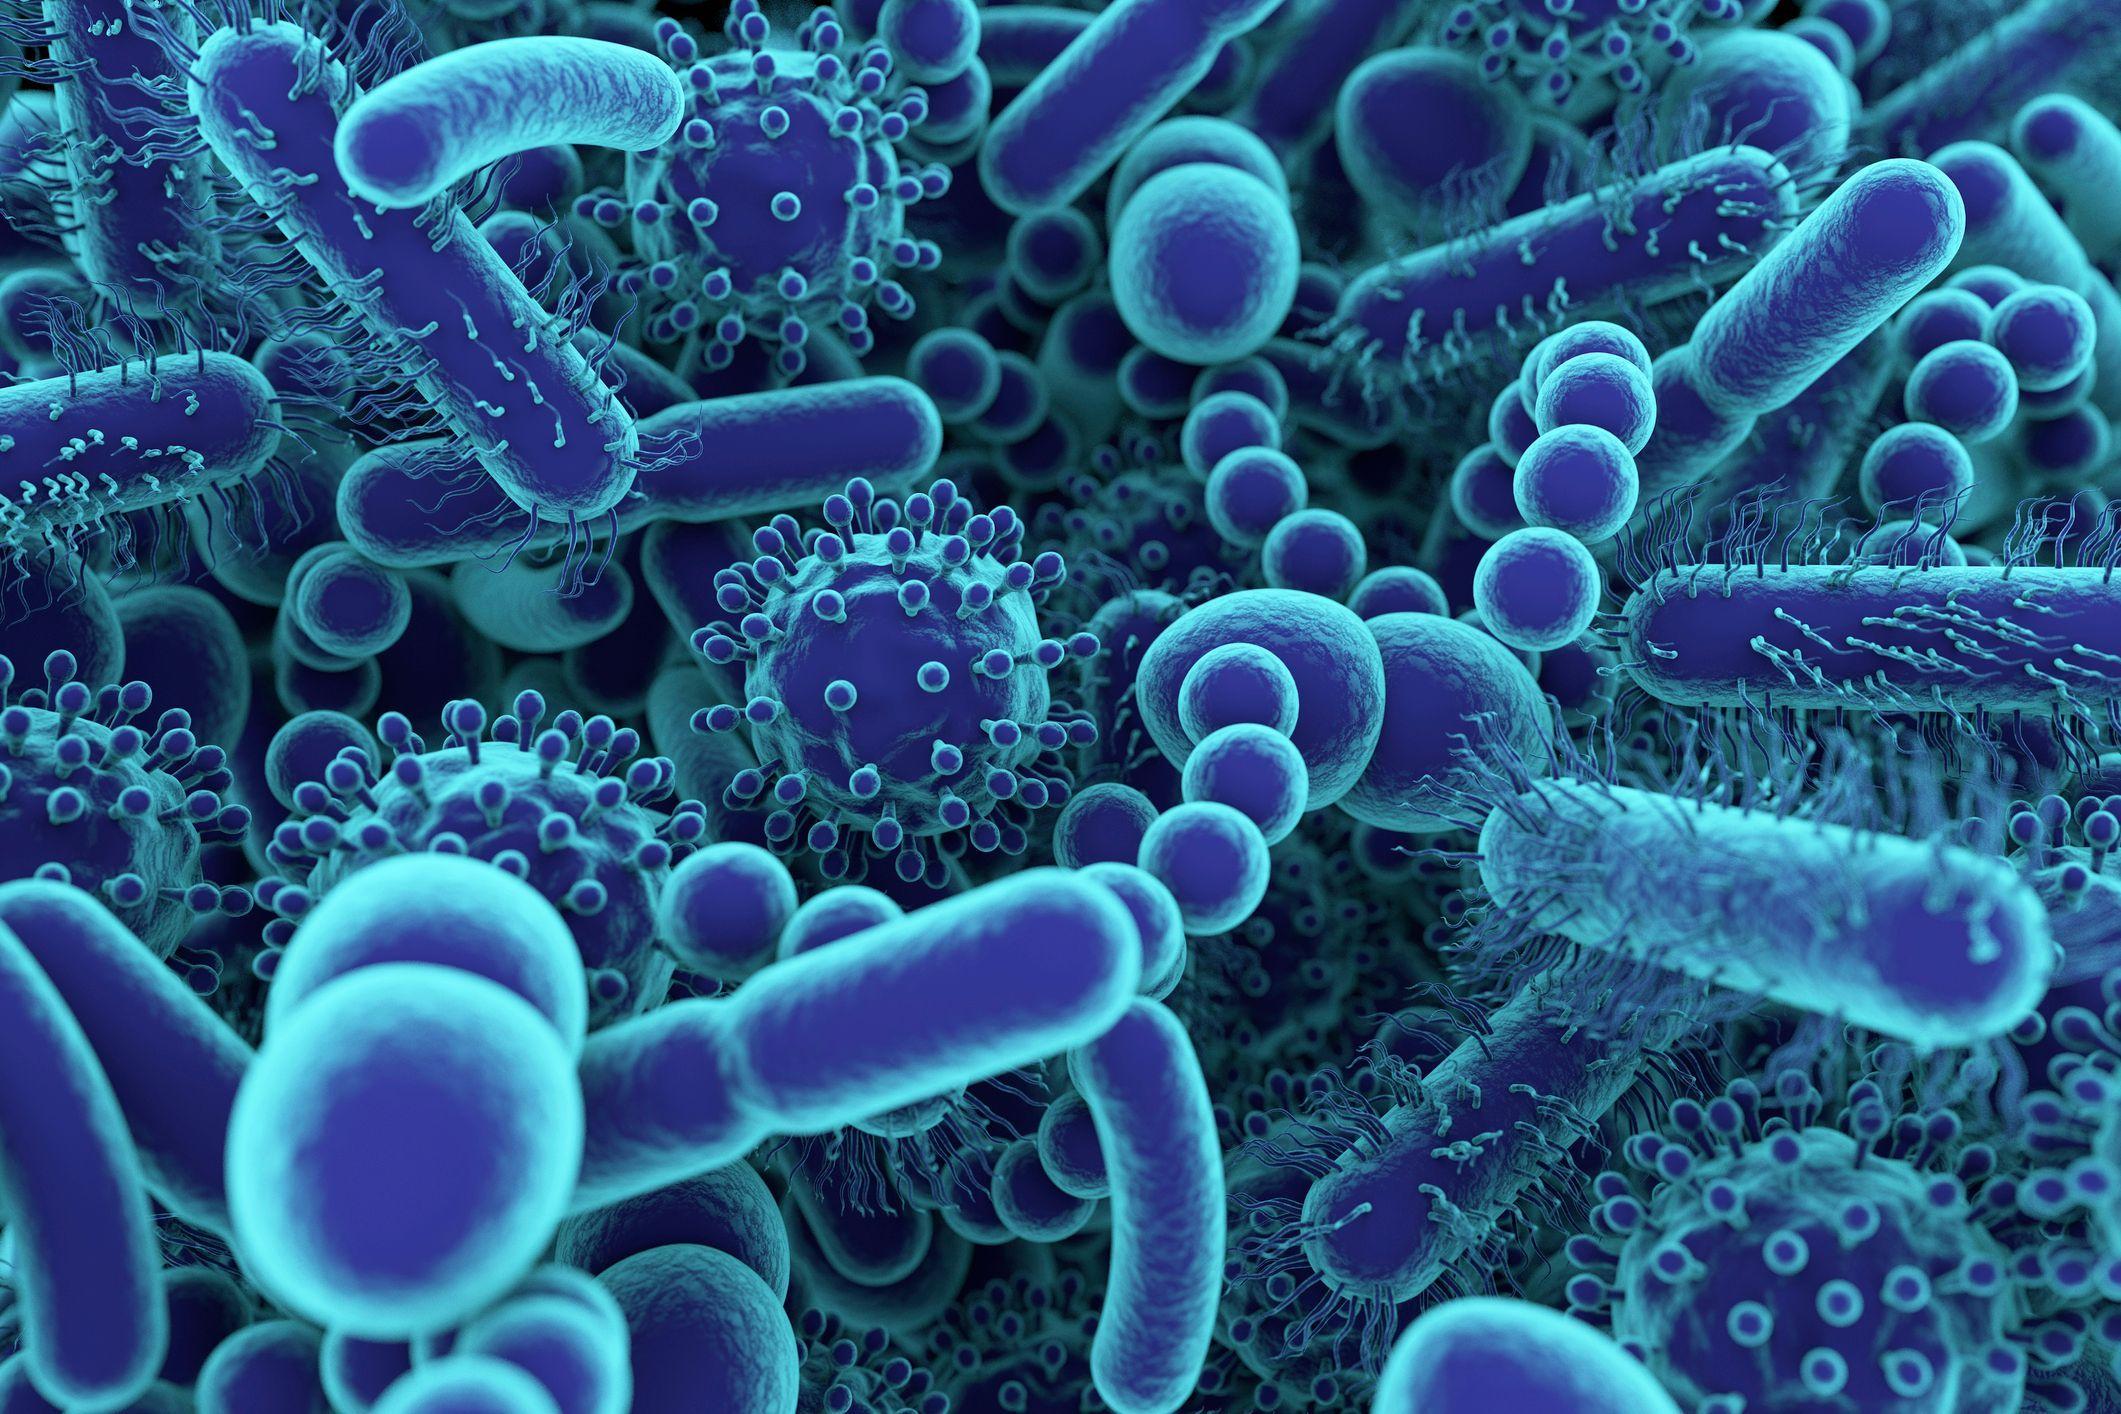 Antibiotiques Overdose GeekAnimea